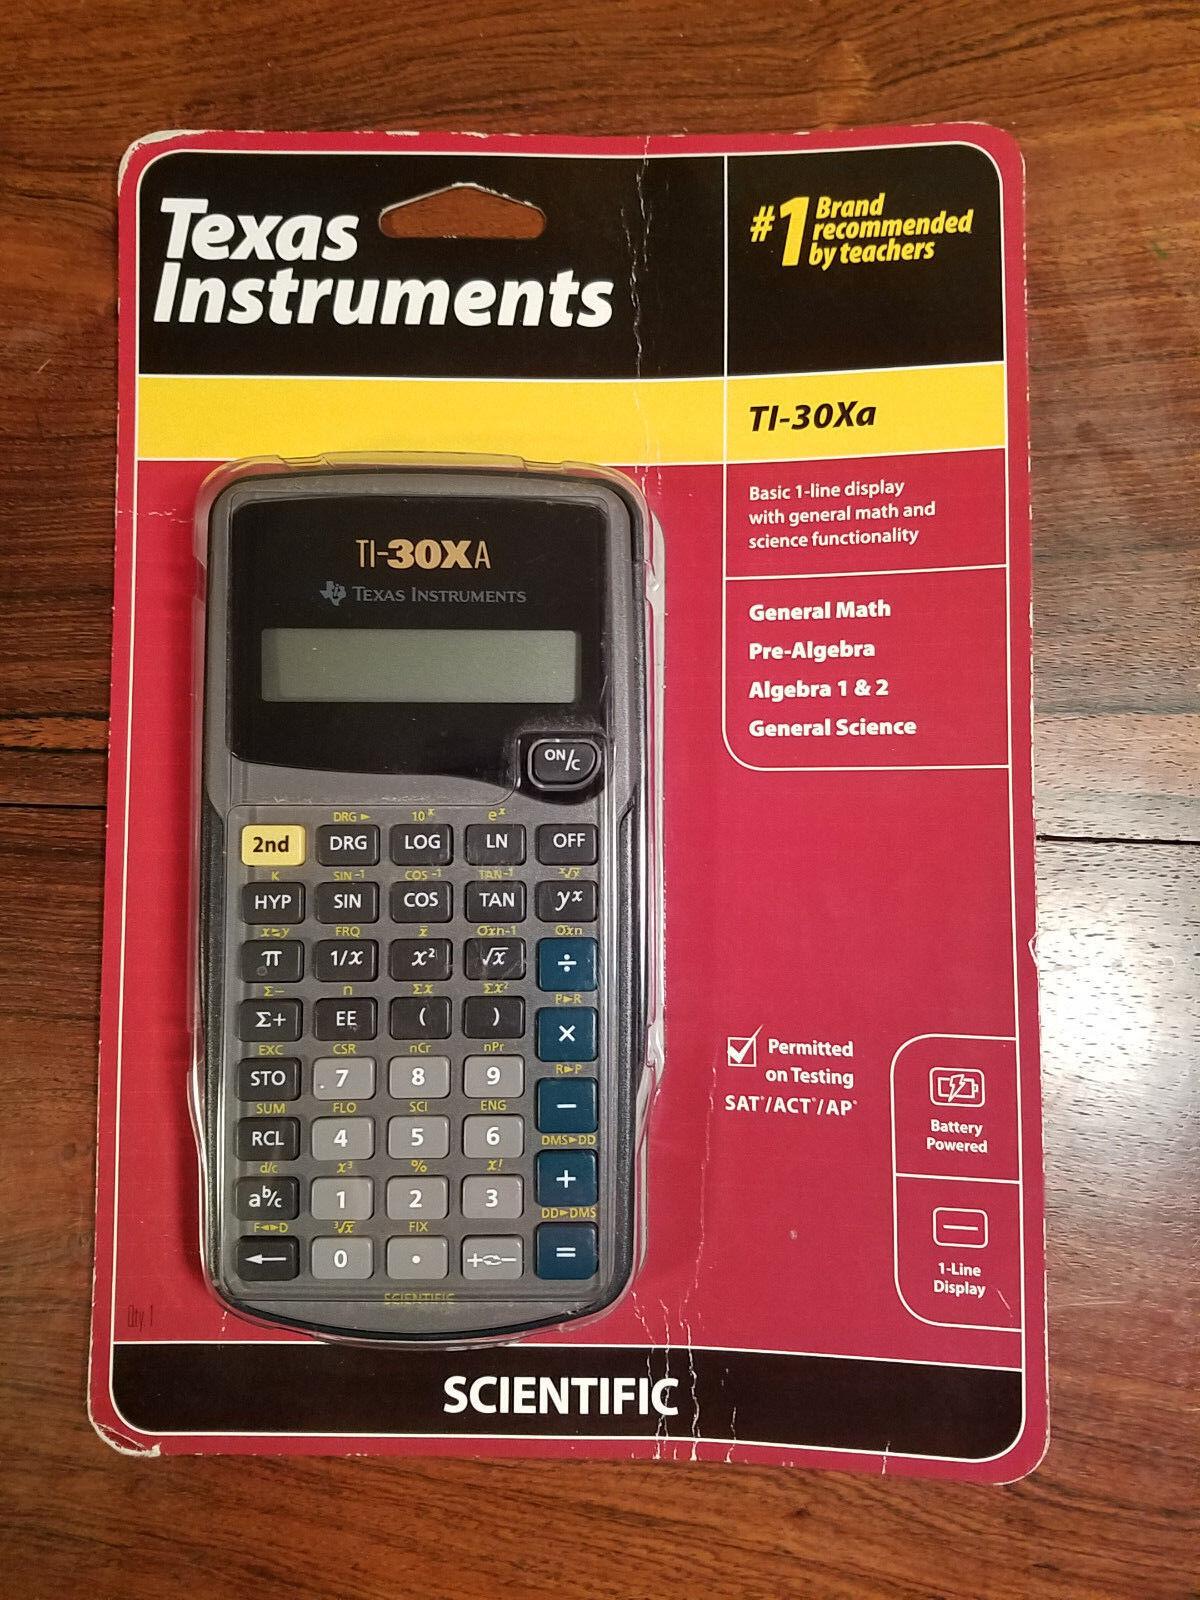 Texas Instruments TI-30XA Scientific Calculator (New in Packaging)